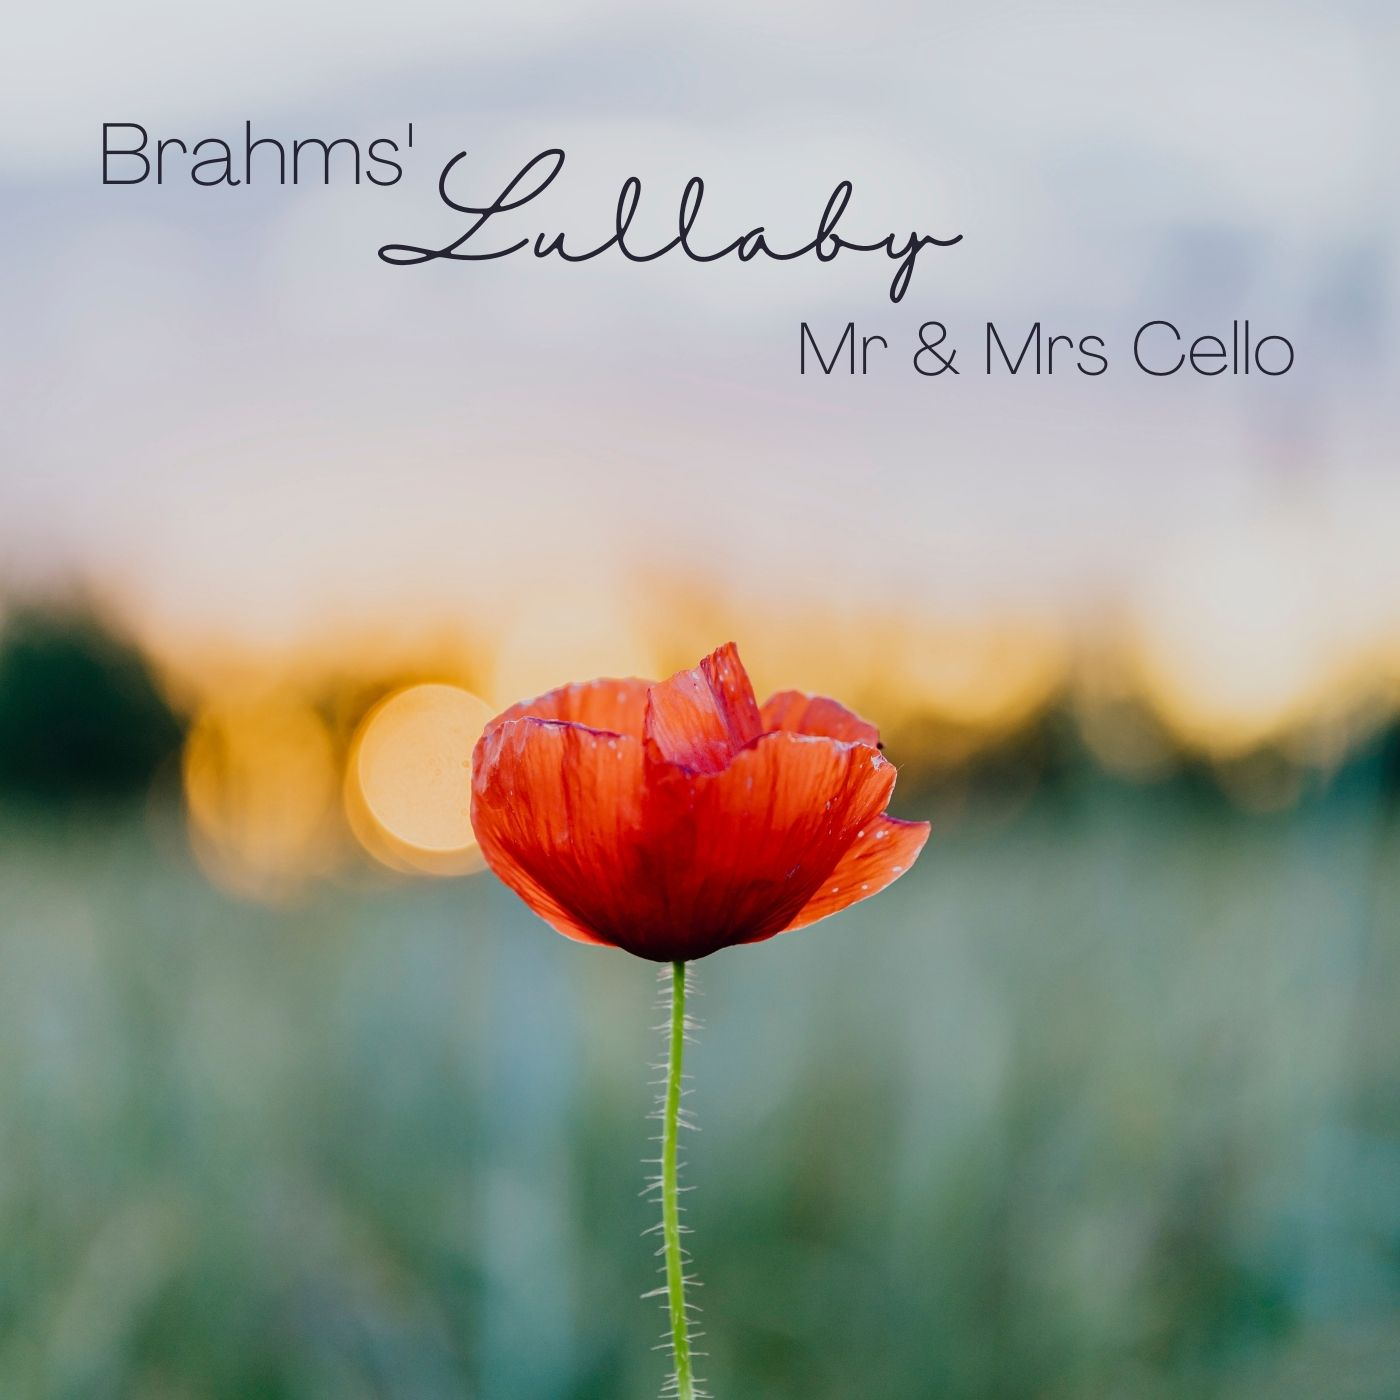 5 Lieder, Op. 49: No. 4, Wiegenlied. Zart bewegt [Brahms' Lullaby (Arr. for Two Cellos)]